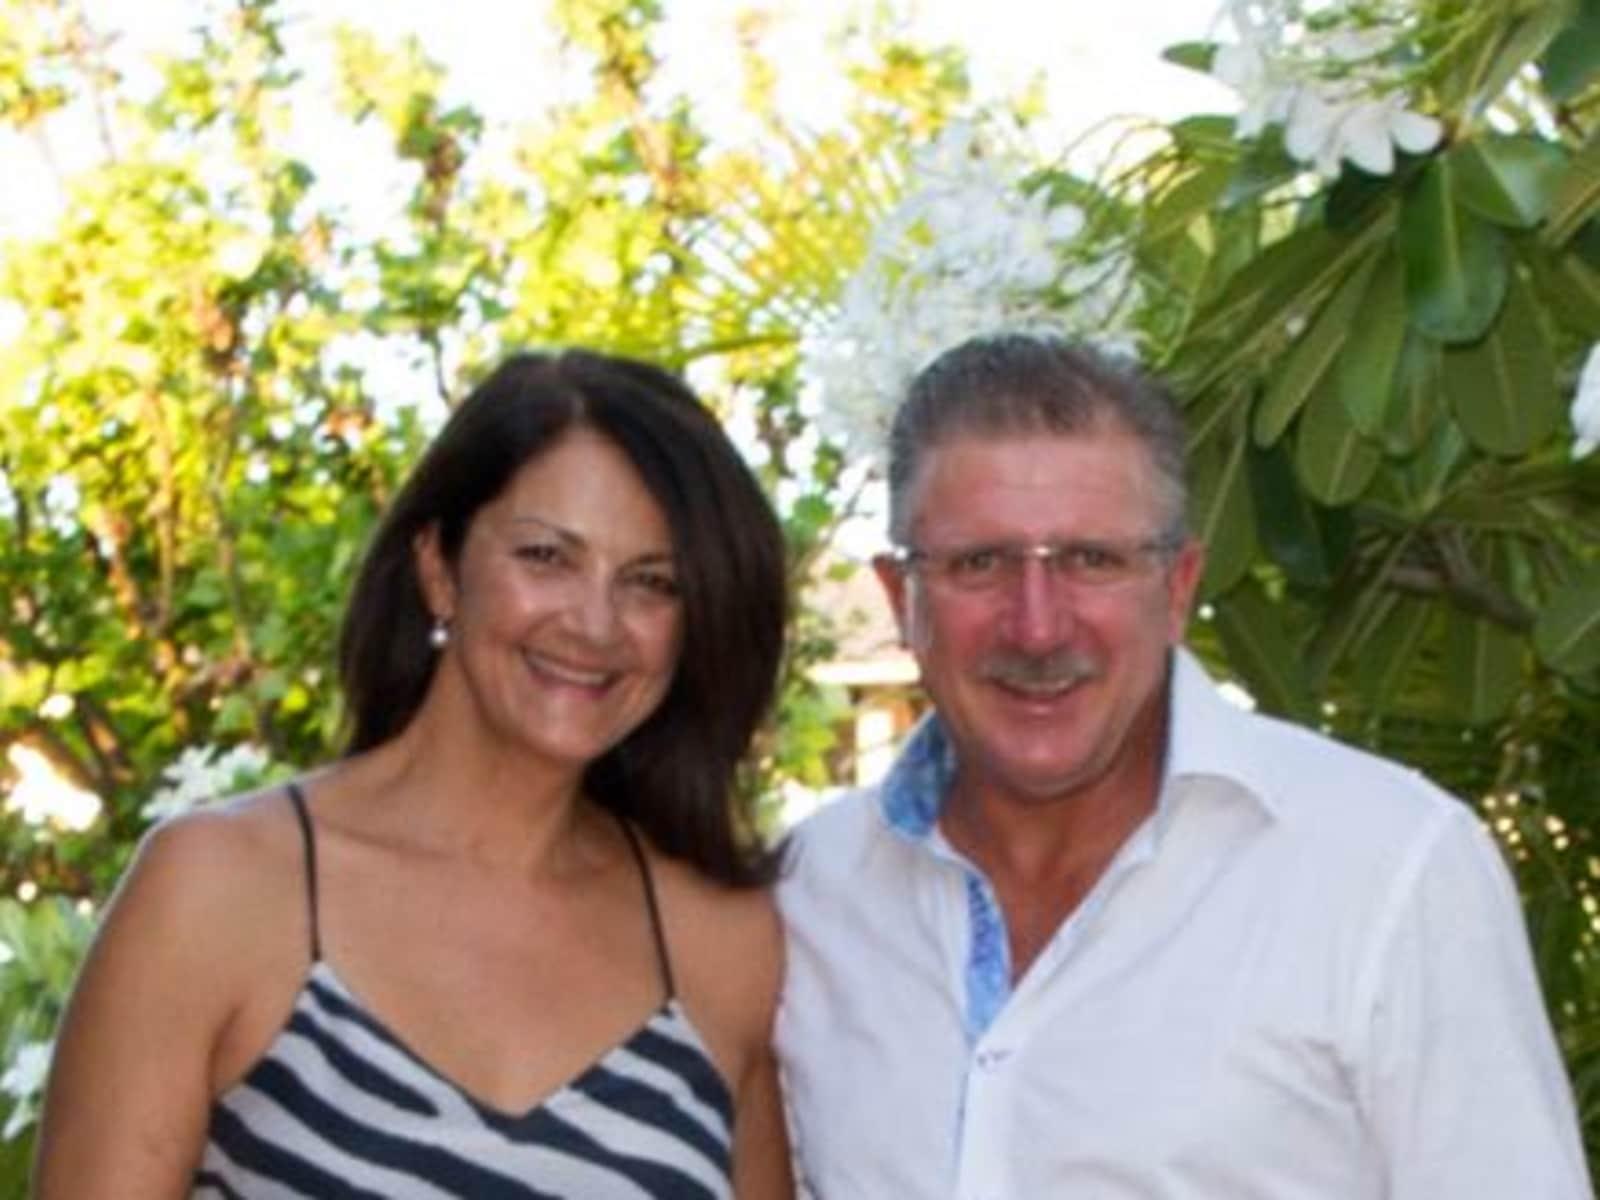 Hilary & Sam from Exmouth, Western Australia, Australia